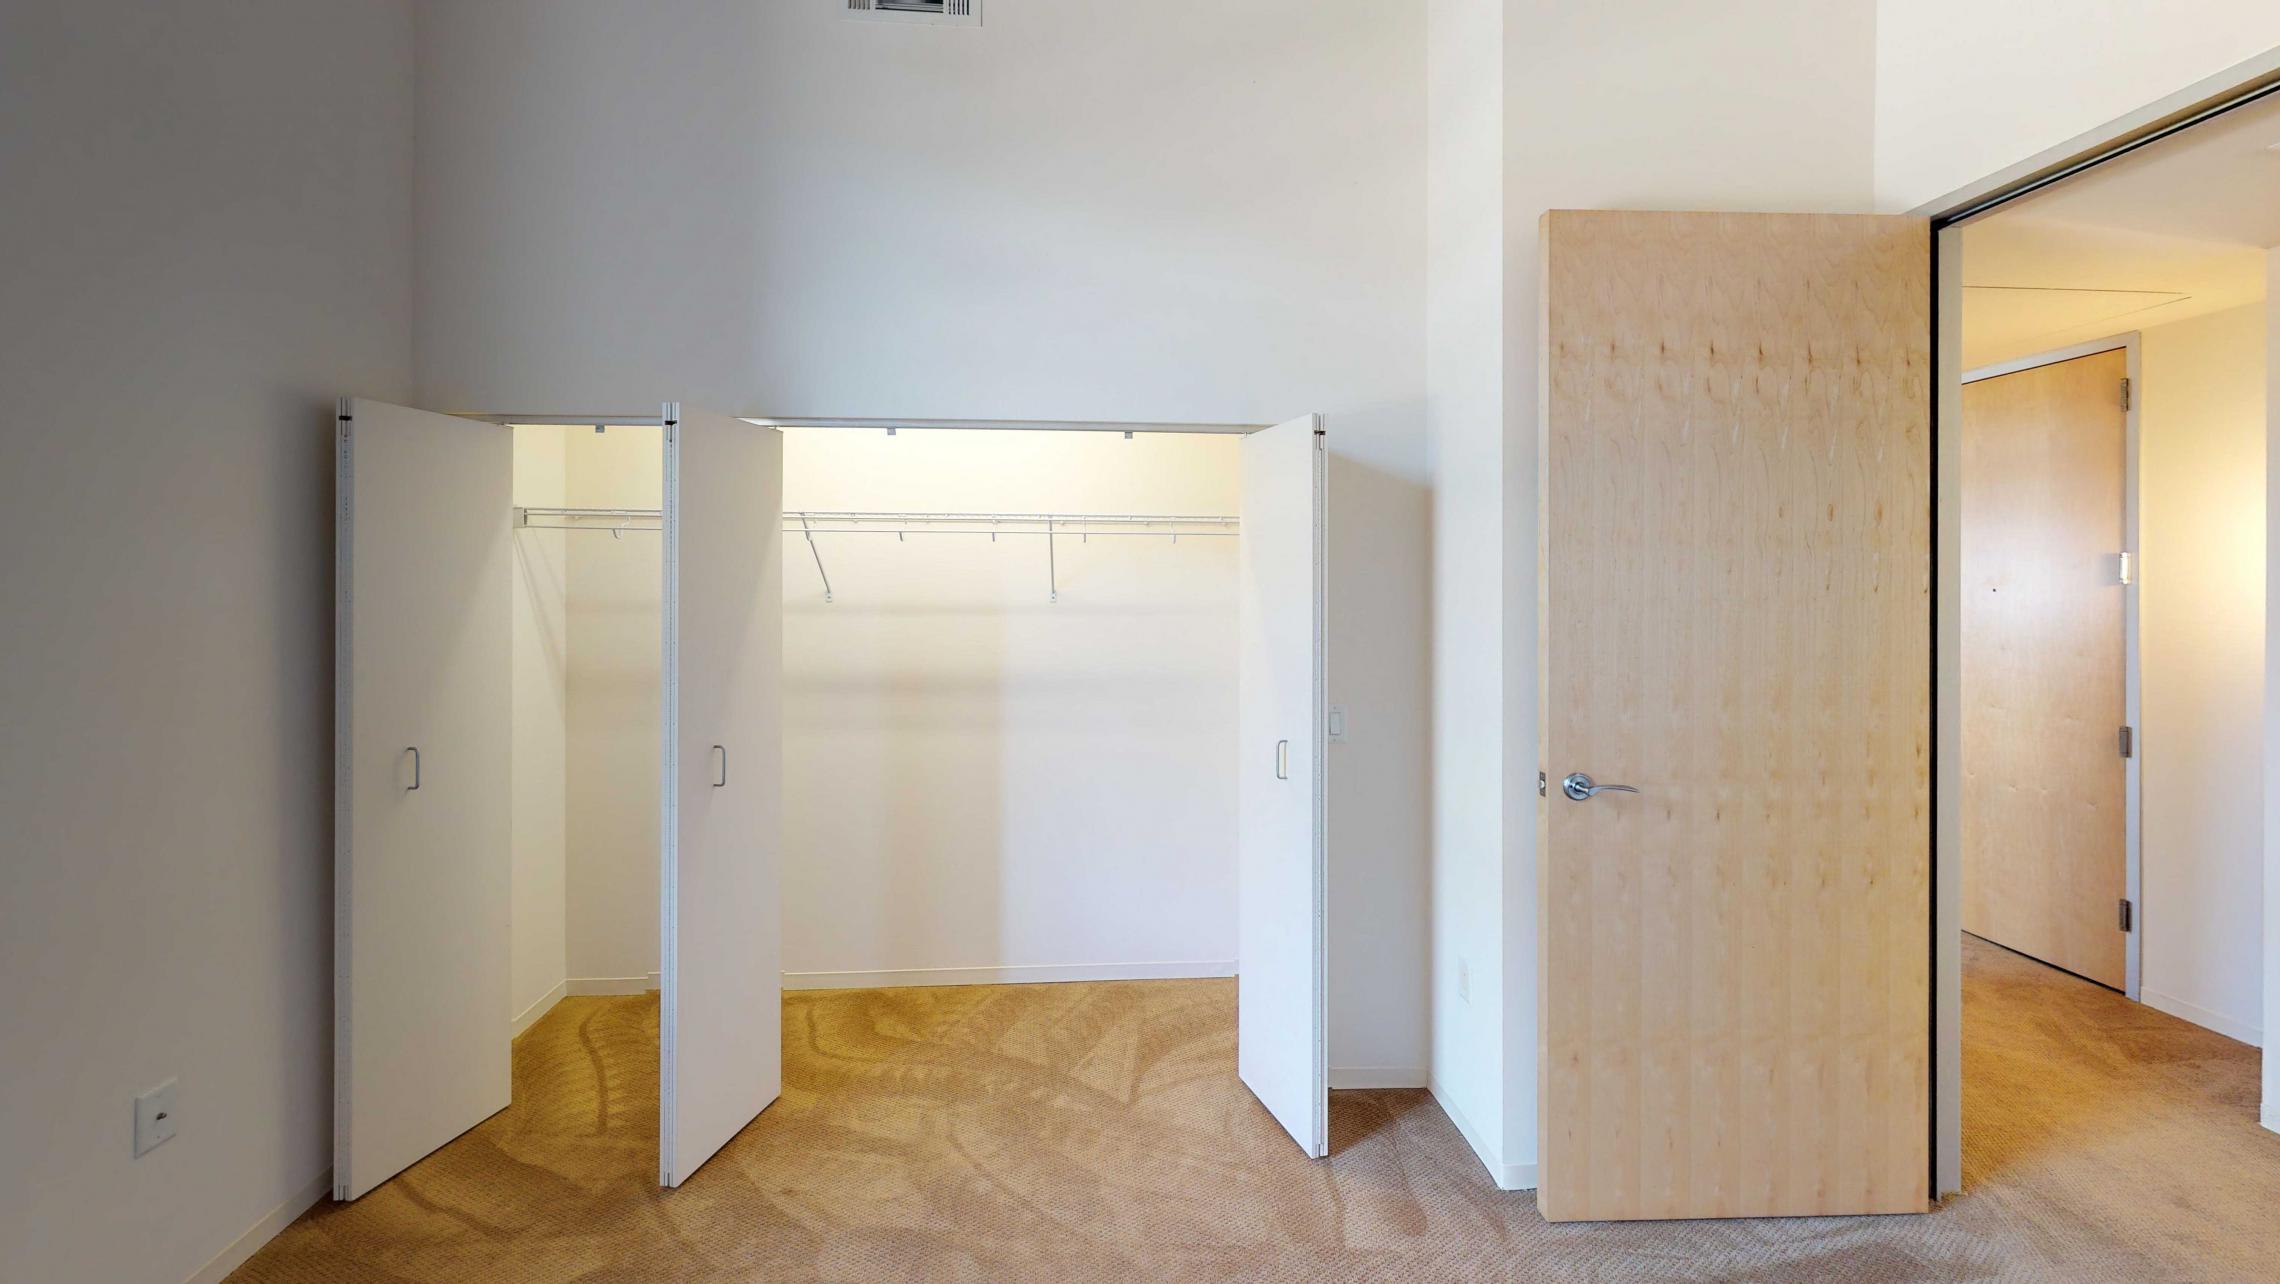 Tobacco-Lofts-Apartment-E210-one-bedroom-Madison-yards-downtown-historic-closet.jpg